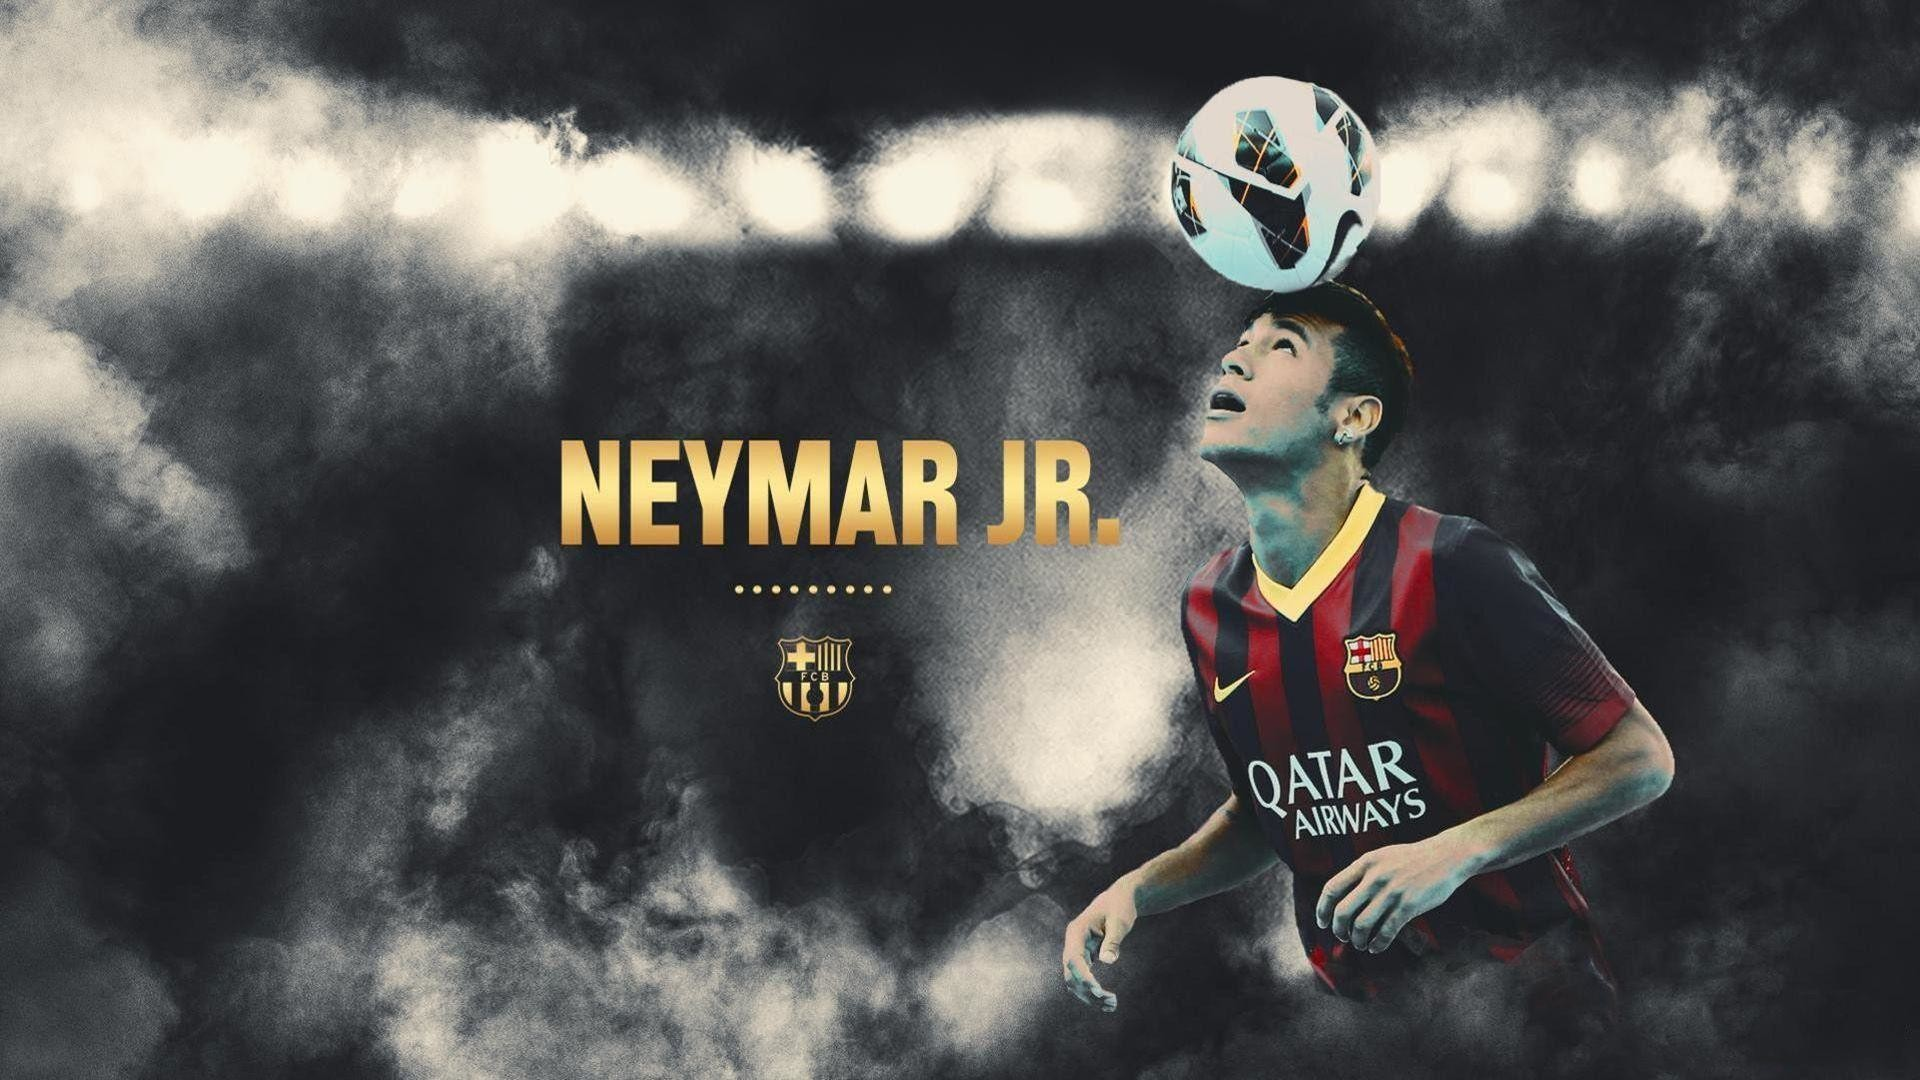 Neymar wallpapers in 2016   Barcelona and Brazil